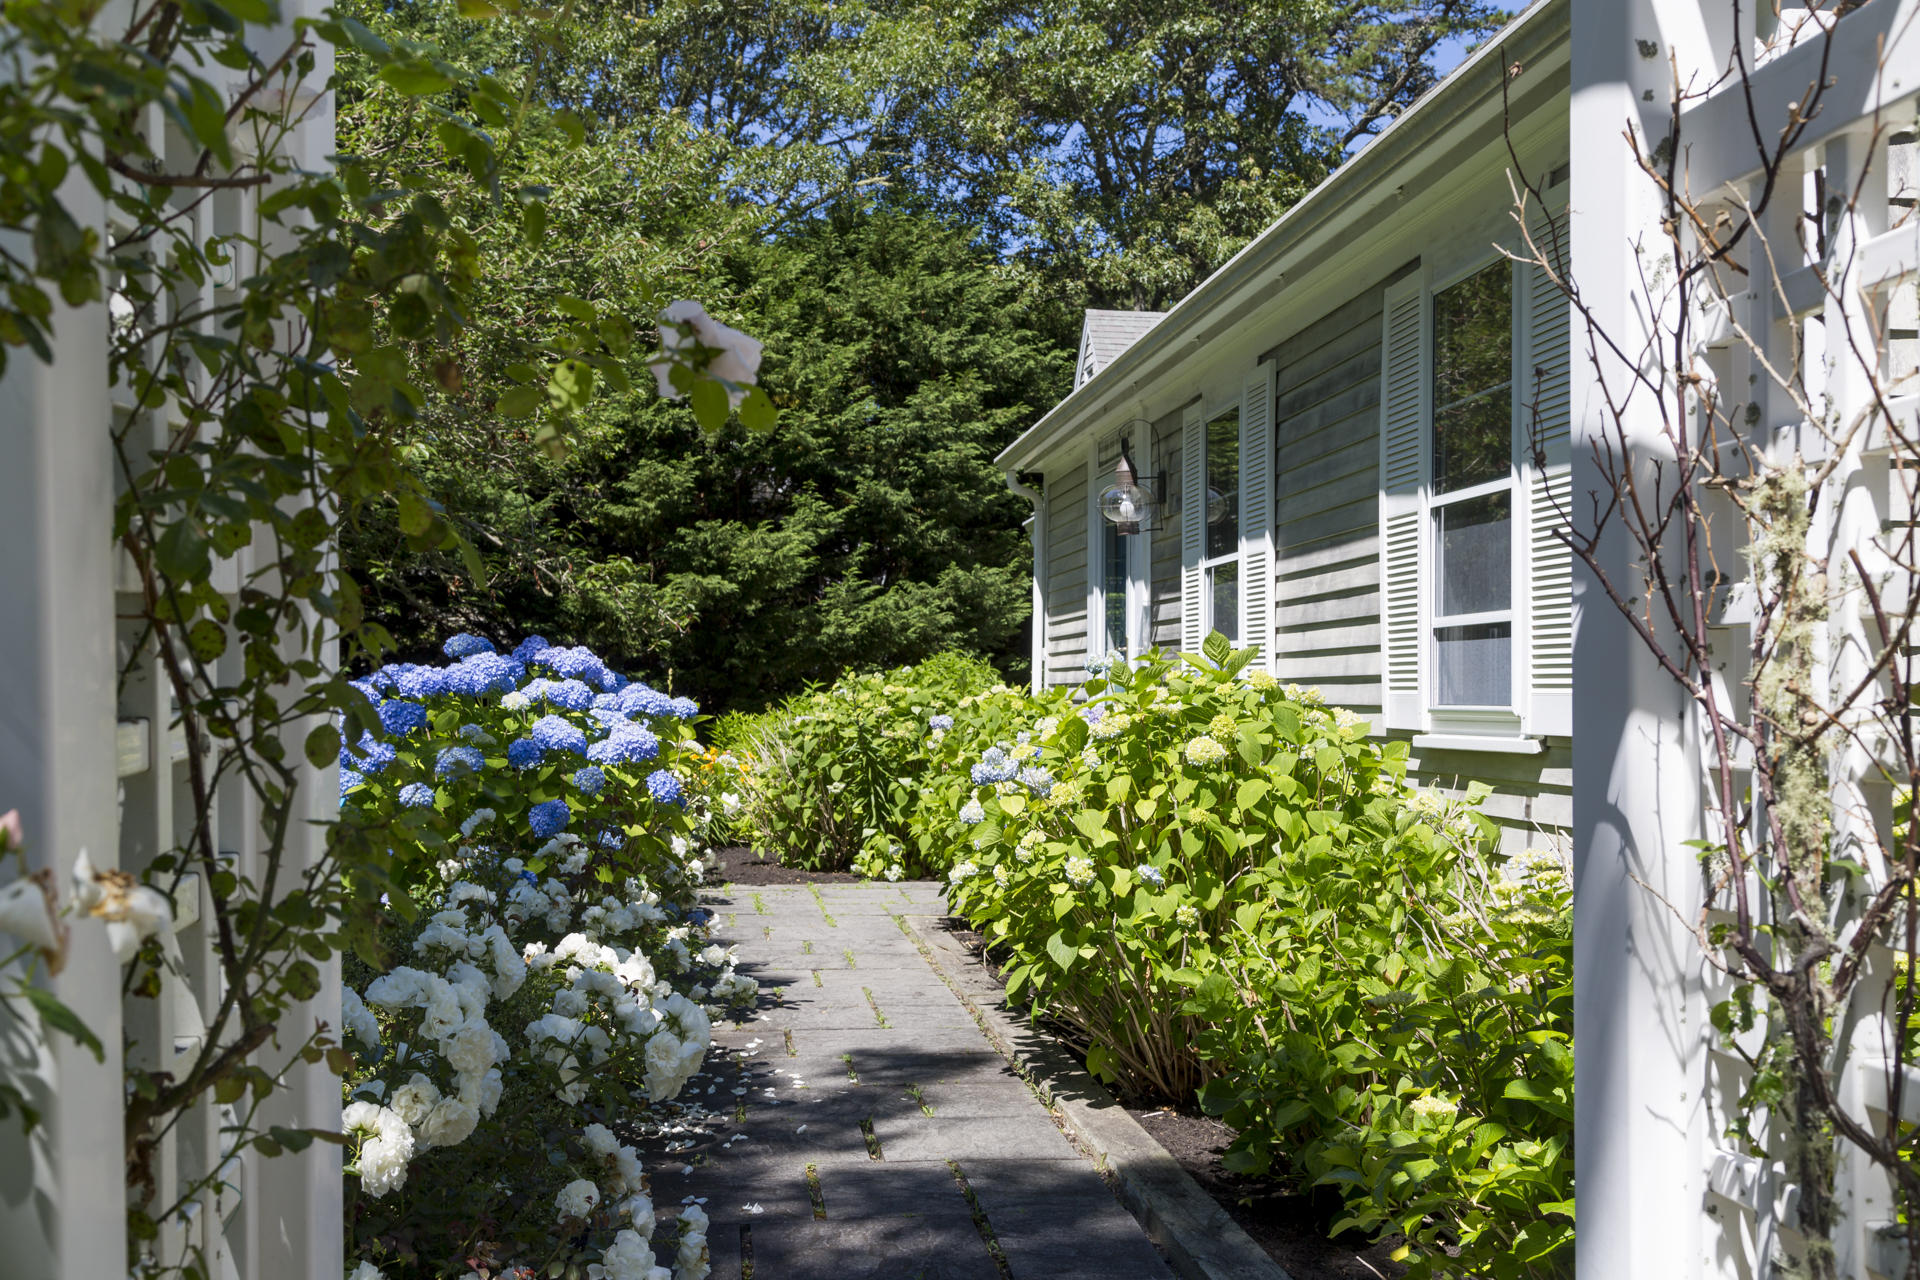 68 Summerhill Lane, Chatham MA, 02633 - slide 28